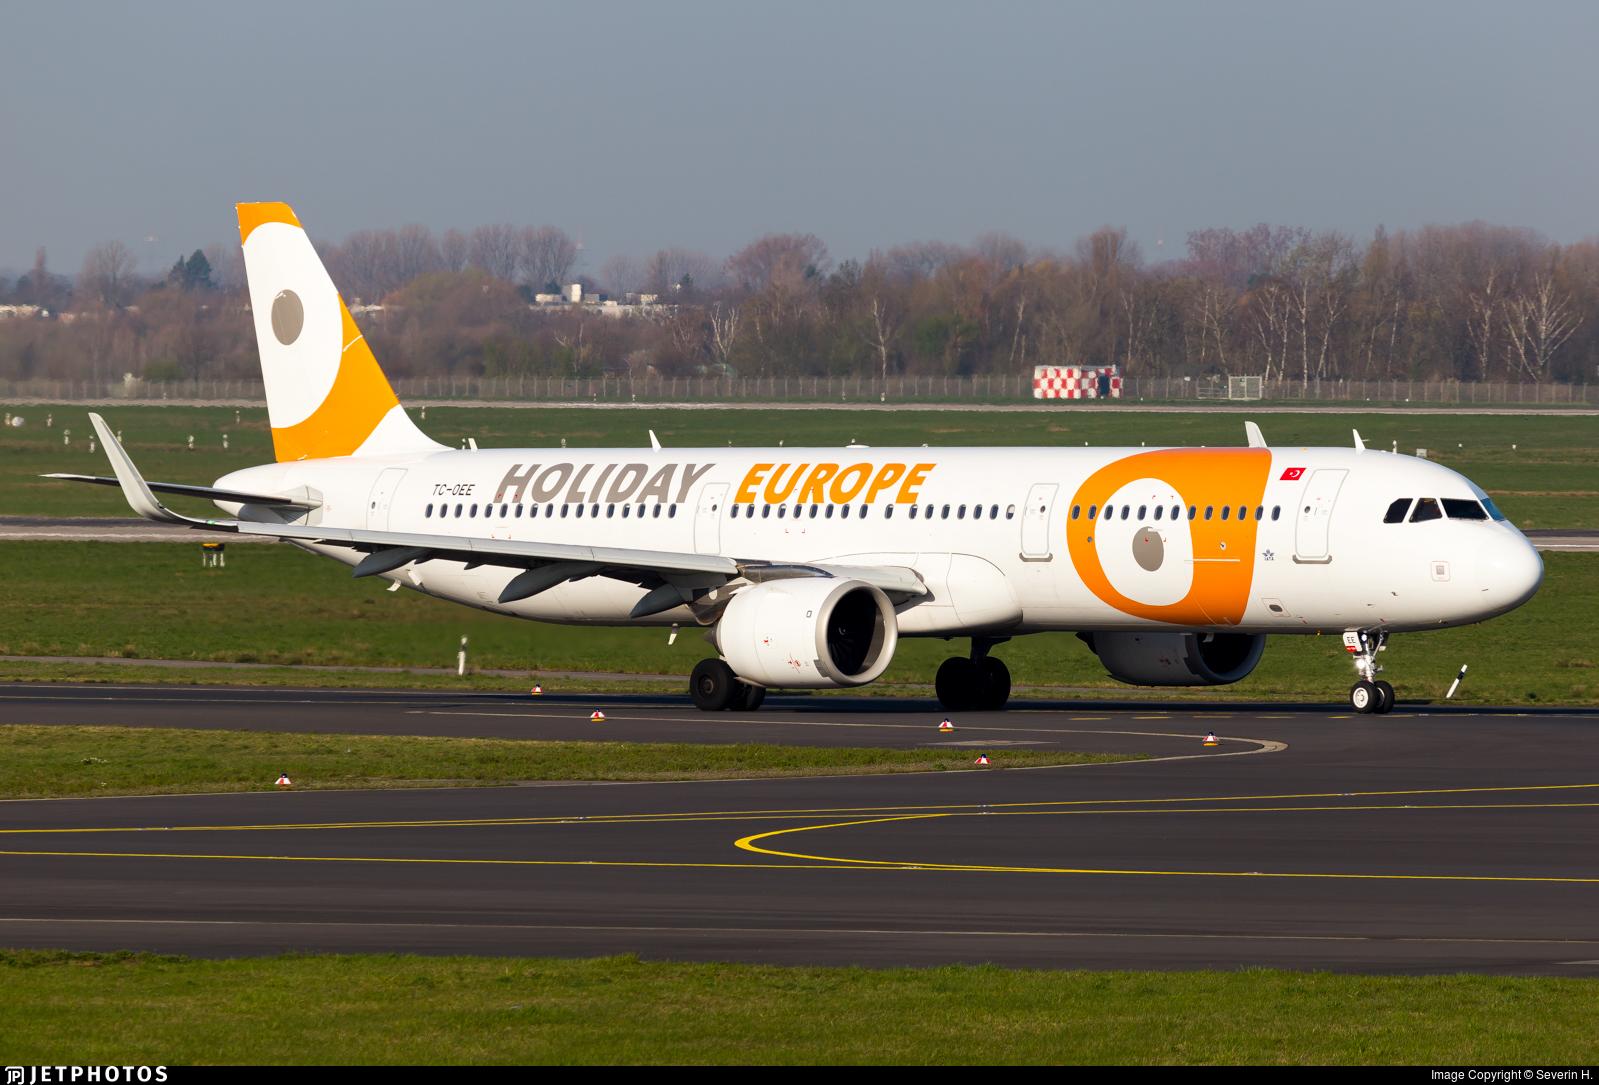 TC-OEE - Airbus A321-253N - Holiday Europe (Onur Air)